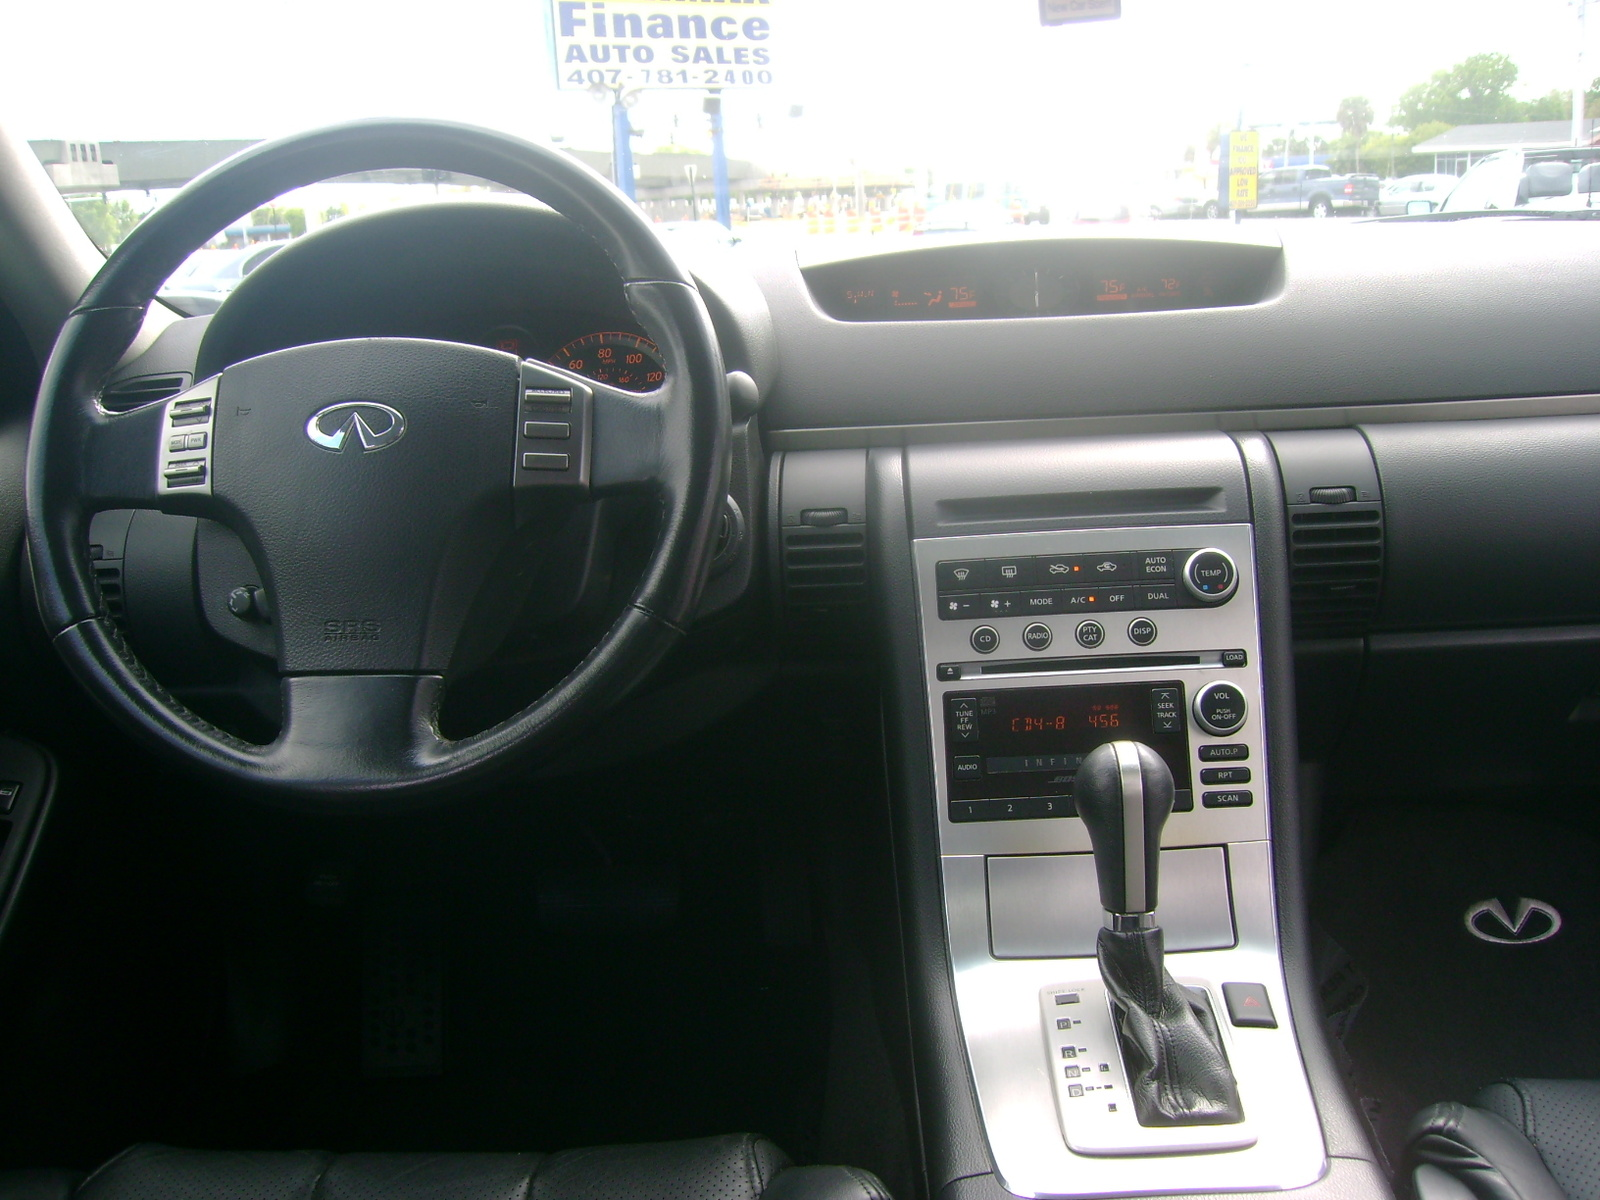 2013 Infiniti Jx35 Price 2013 Infiniti Jx35 Steering Wheel